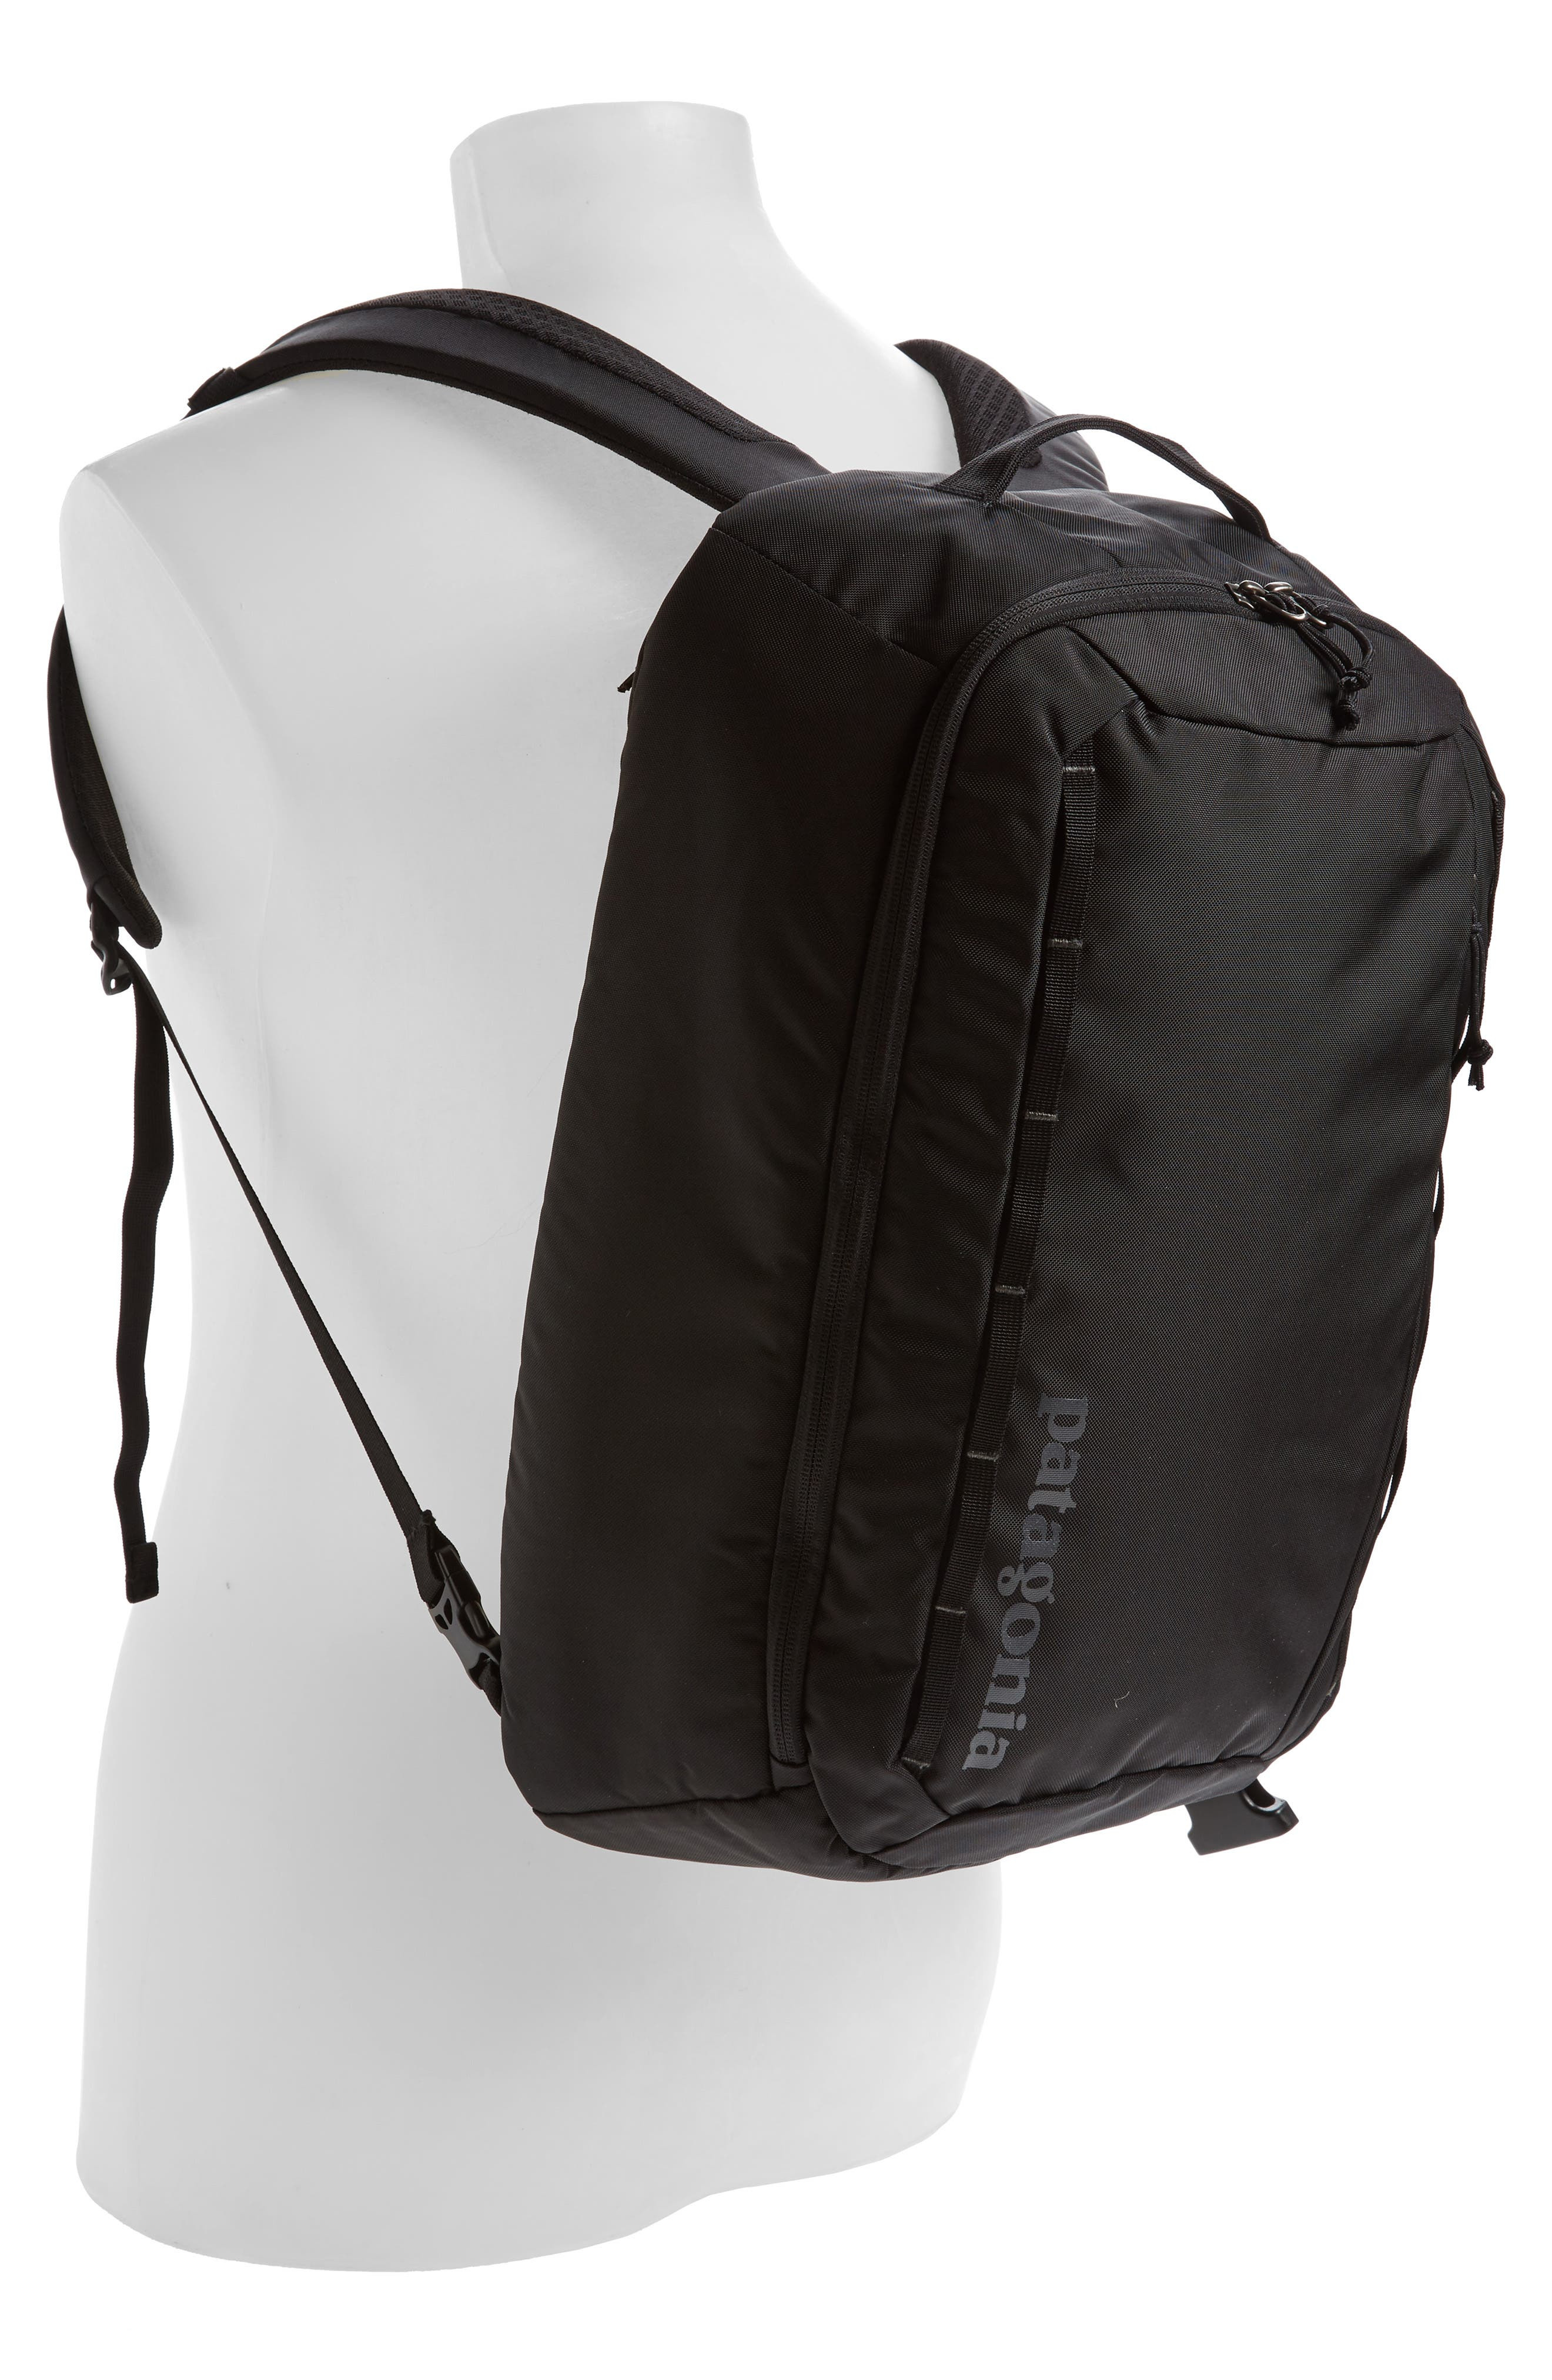 Tres 25-Liter Convertible Backpack,                             Alternate thumbnail 2, color,                             BLACK